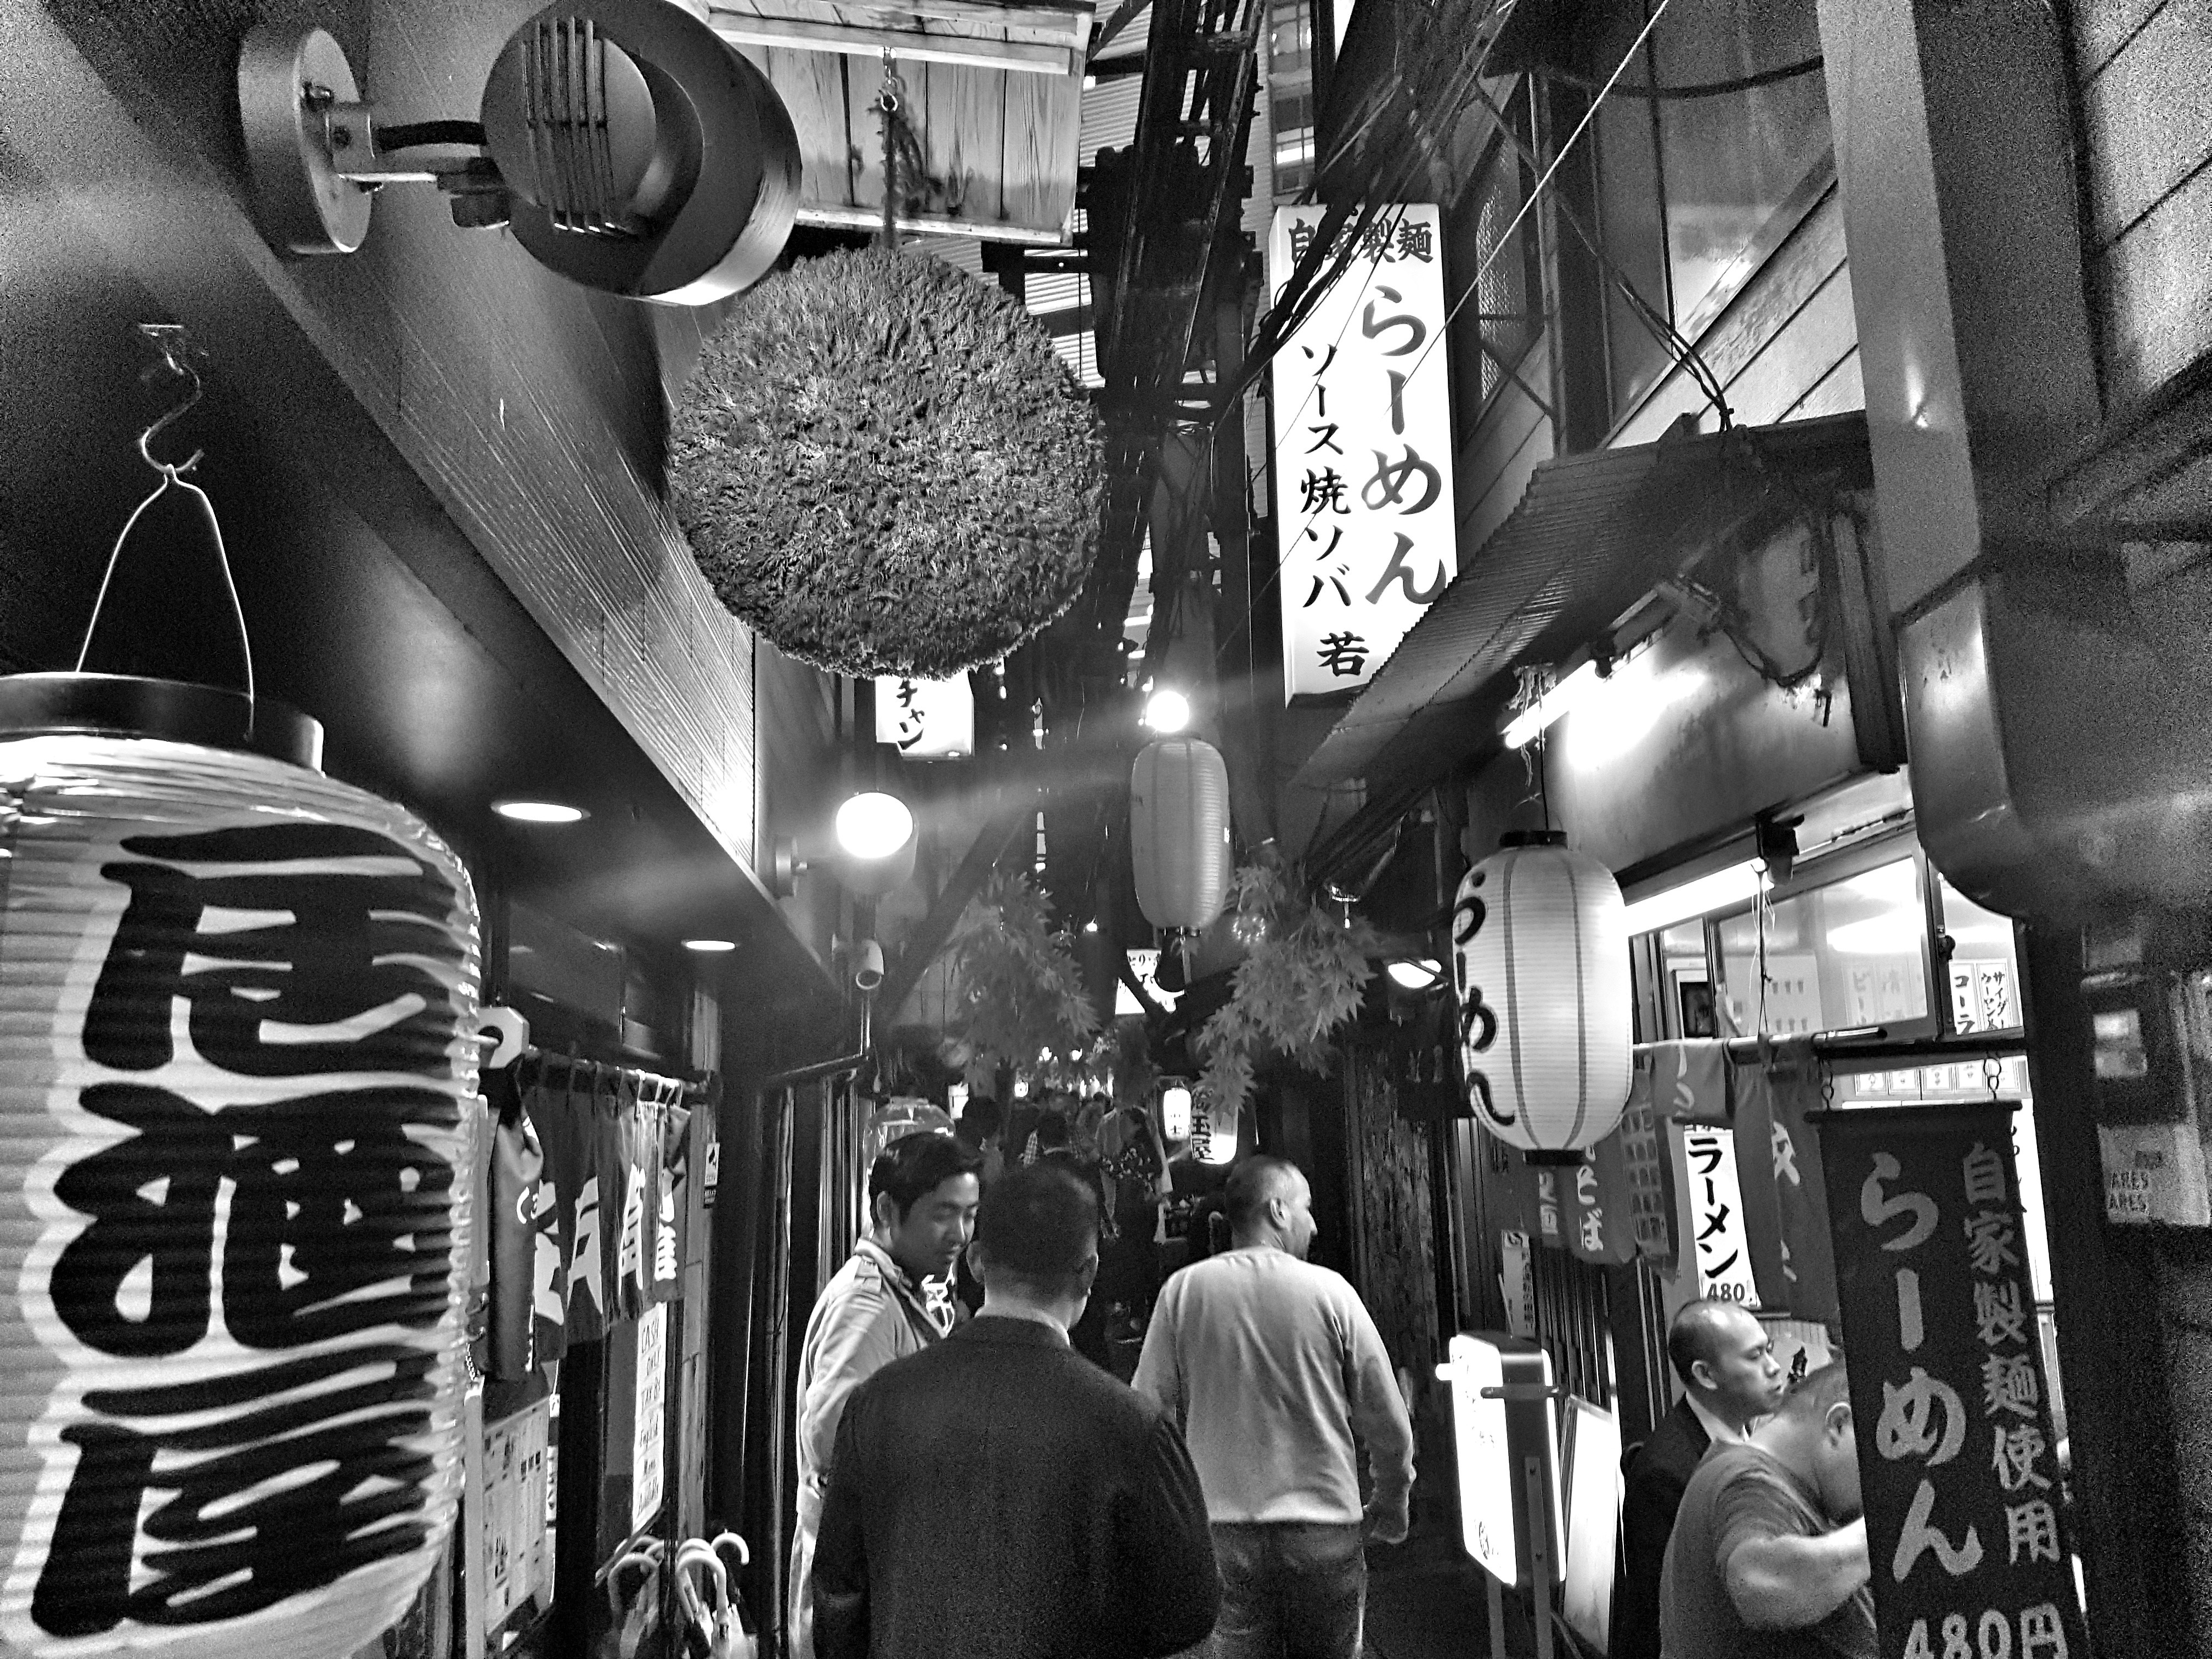 Piss Alley in Shinjuku, Tokyo (ph. Daniele Grattarola)